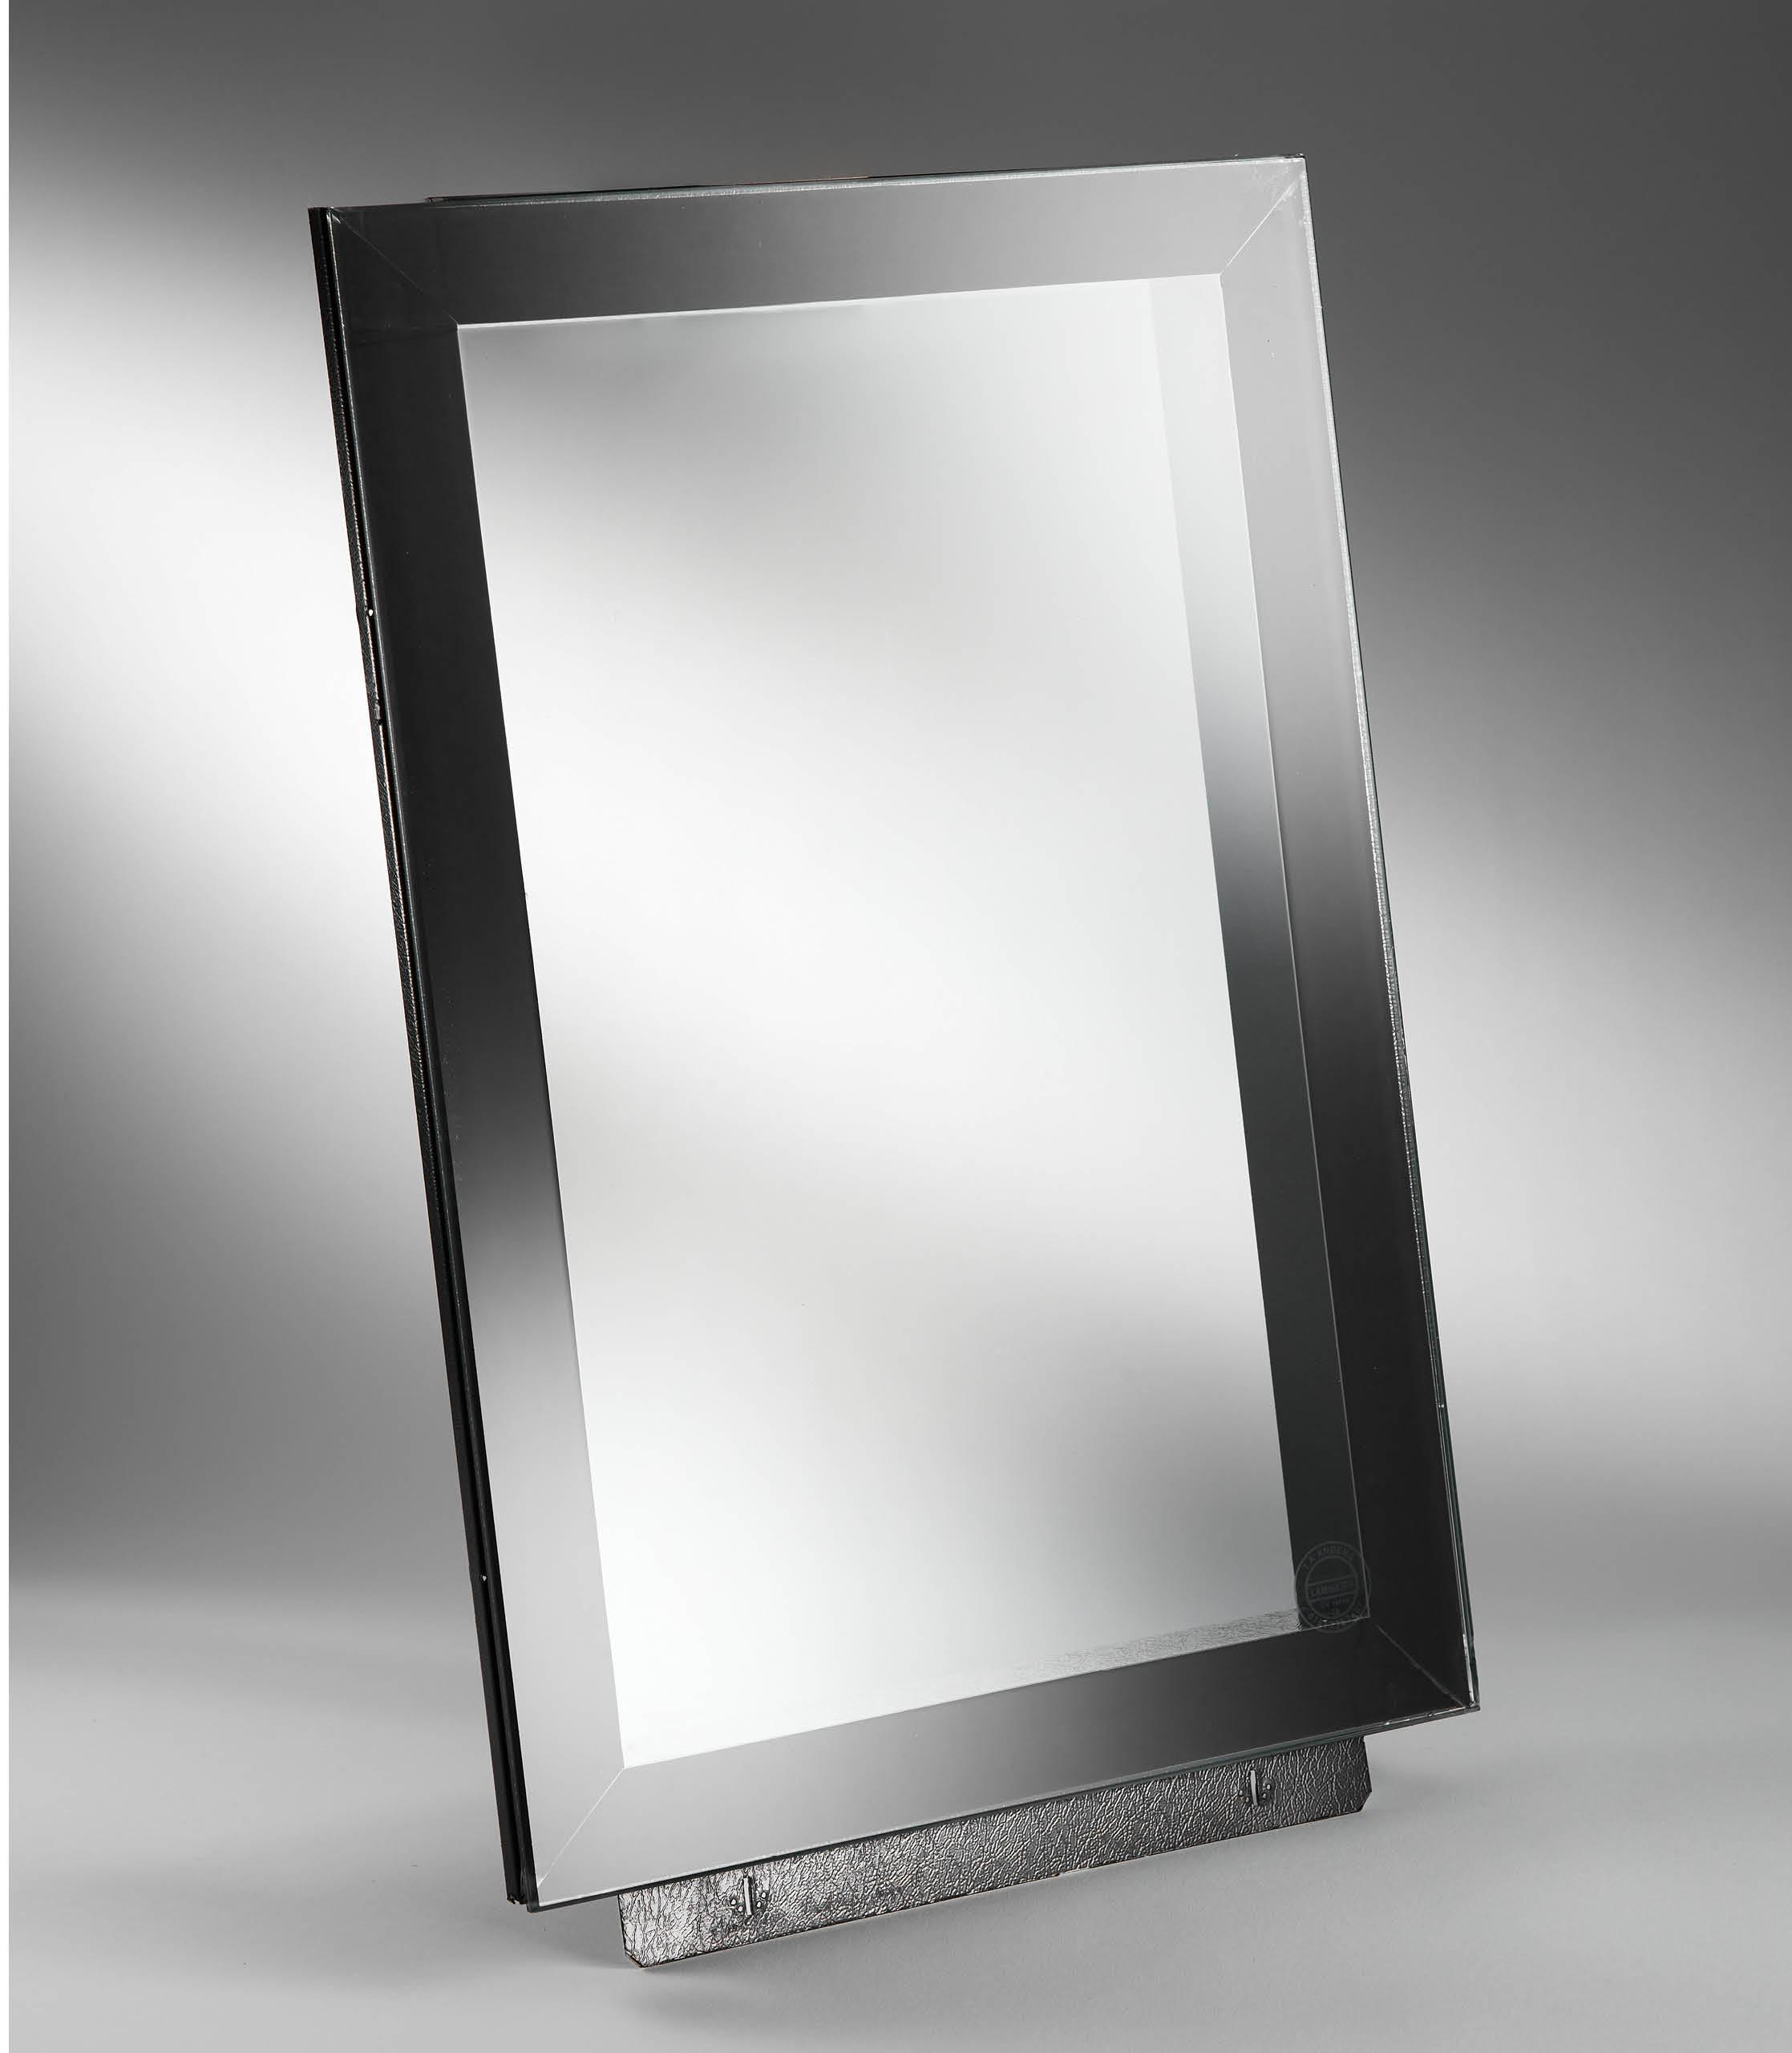 Glazed partition